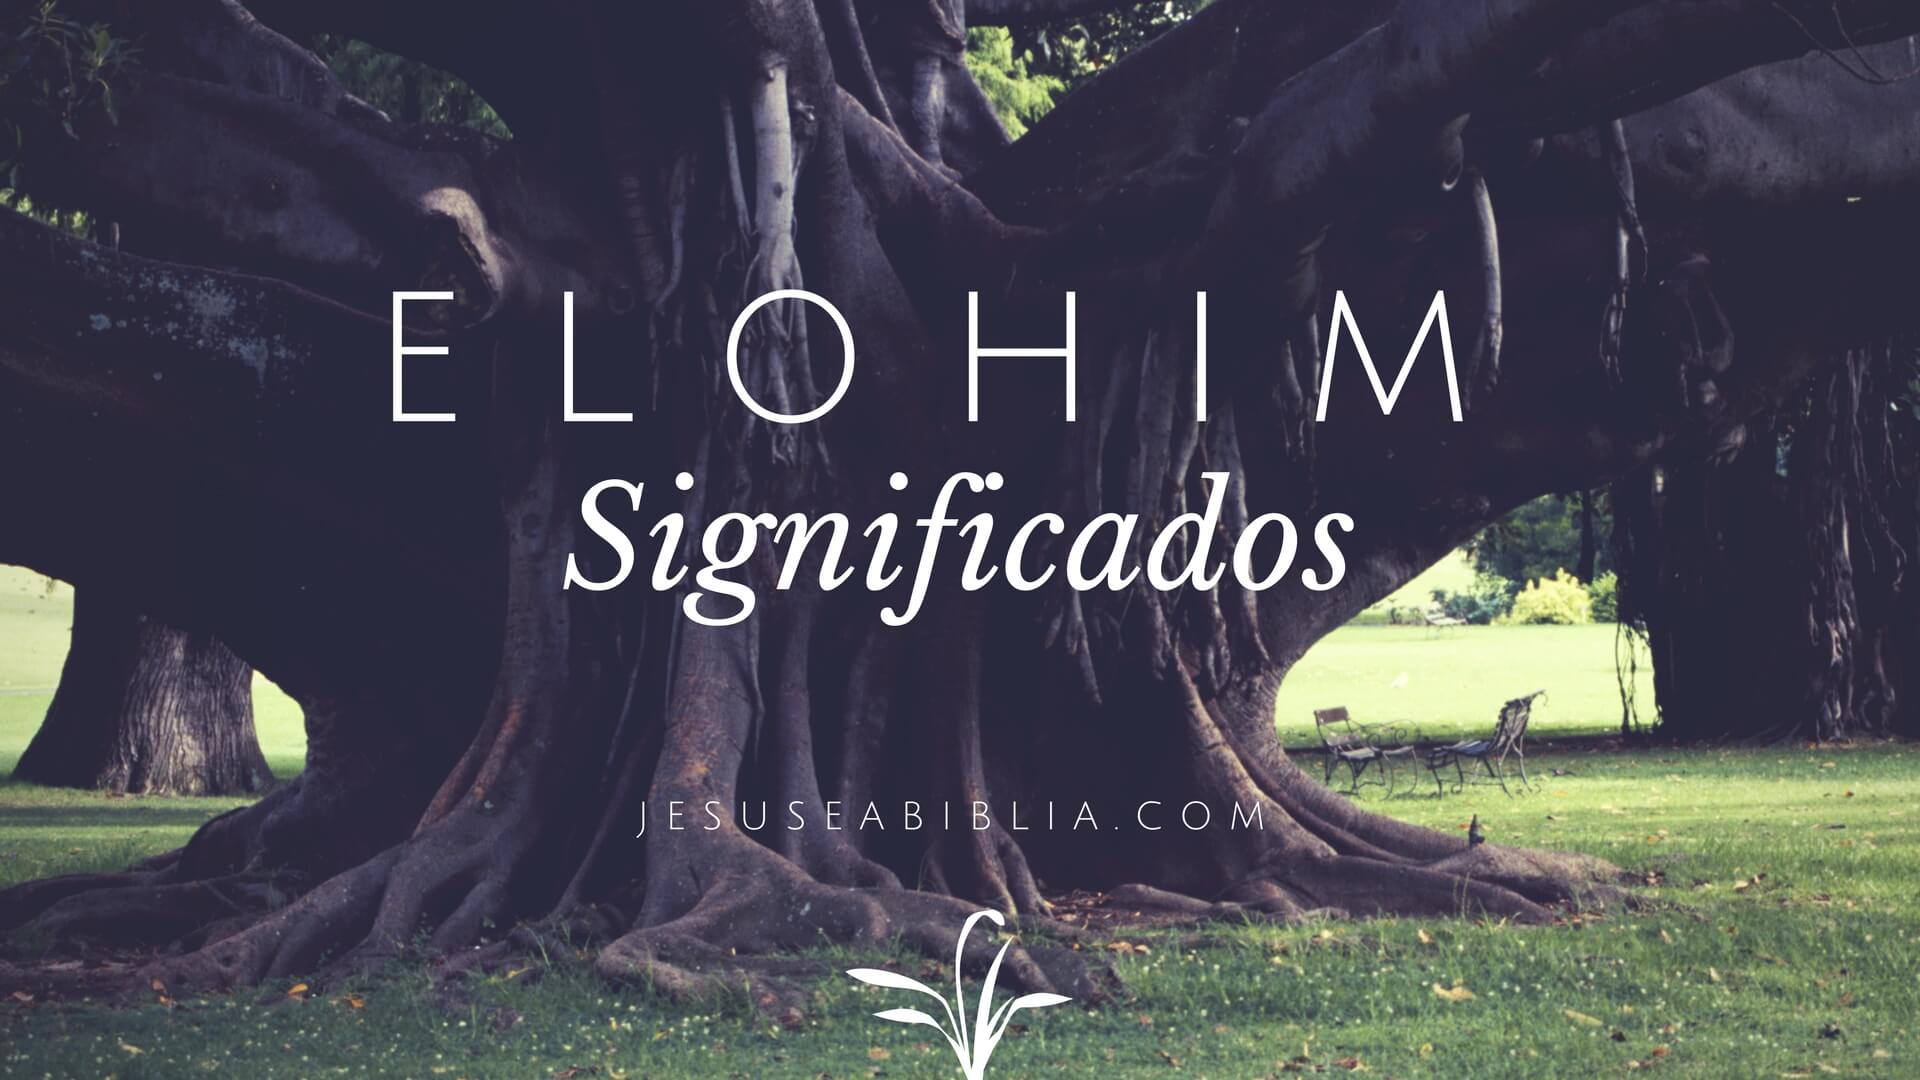 Elohim Significado - Estudos Bíblicos